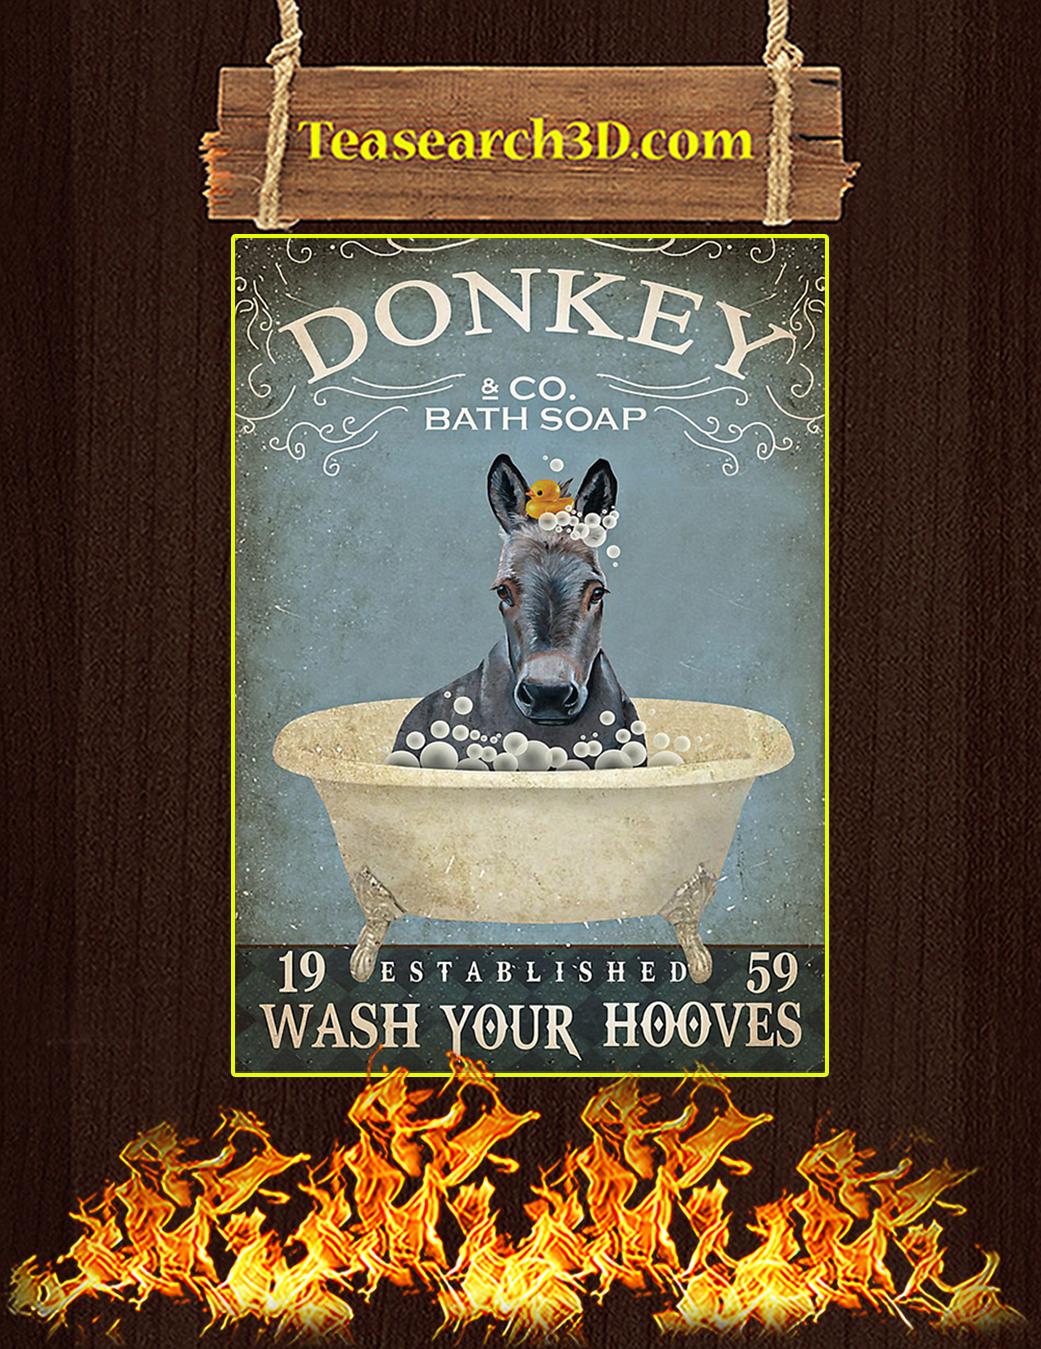 Bath soap company donkey poster A1